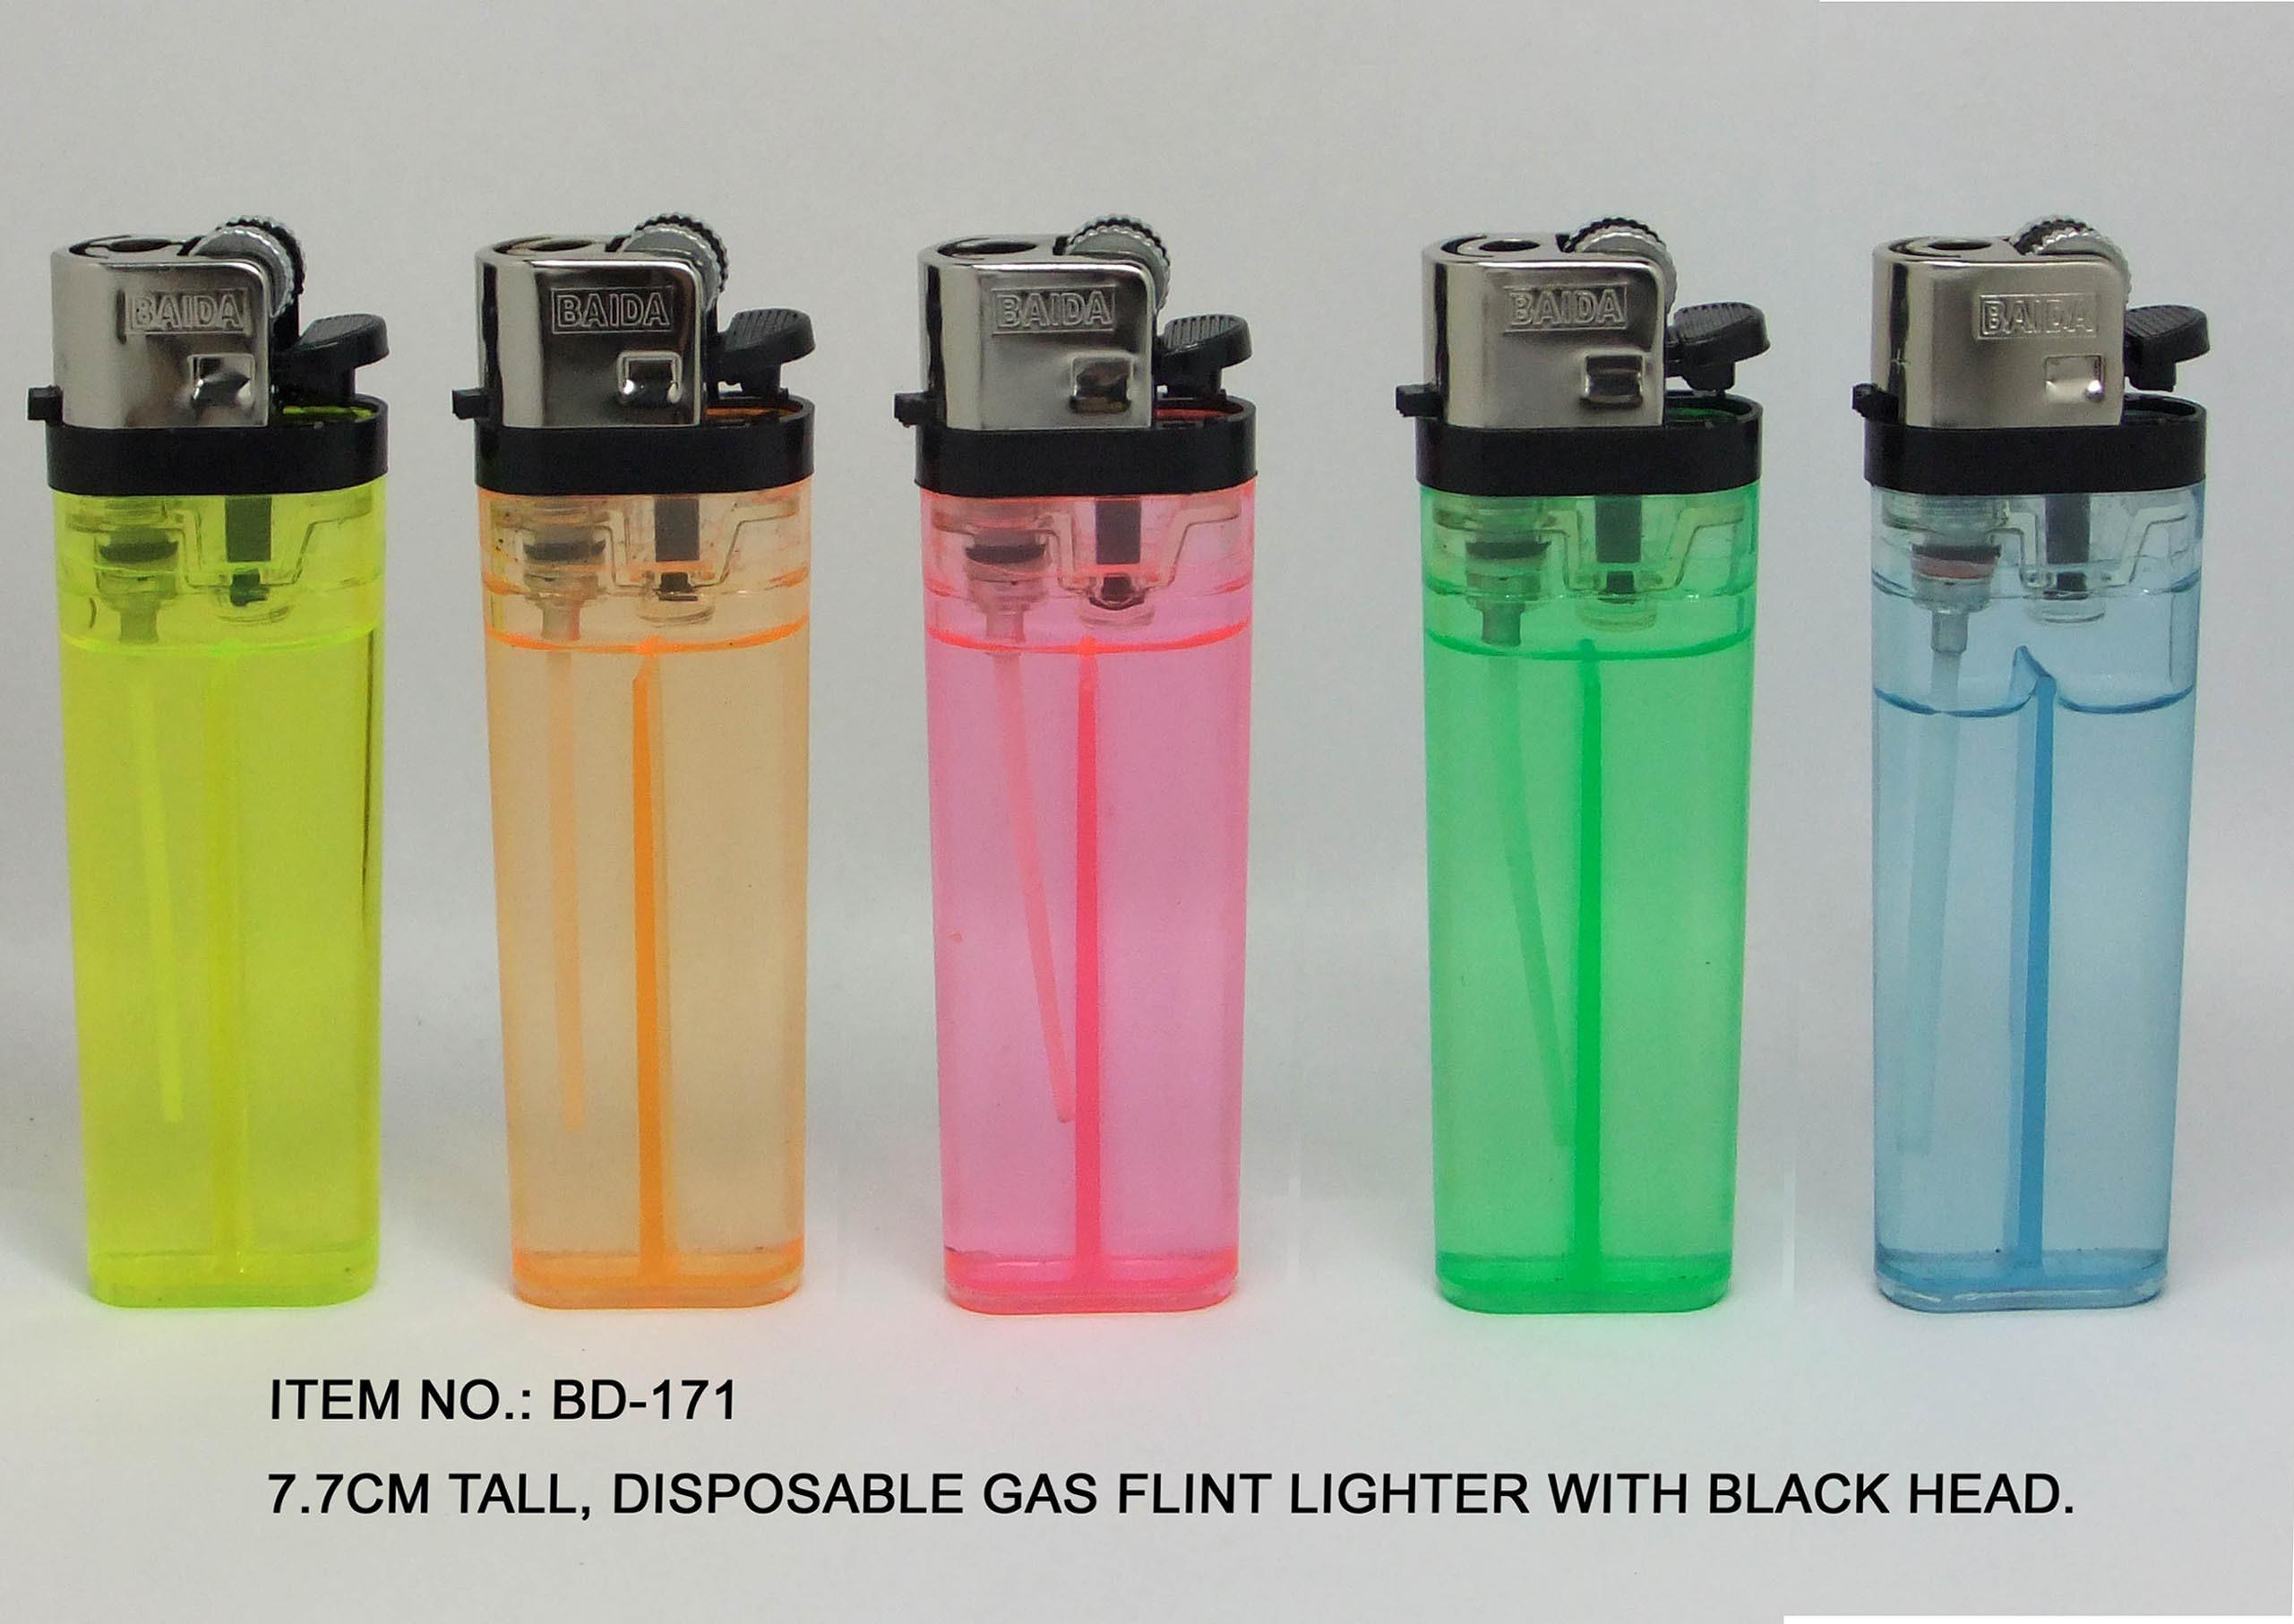 (Item No.BD171) 7.7cm Disposable Gas Lighter With Black Head, Flint Lighter, Baida Lighter